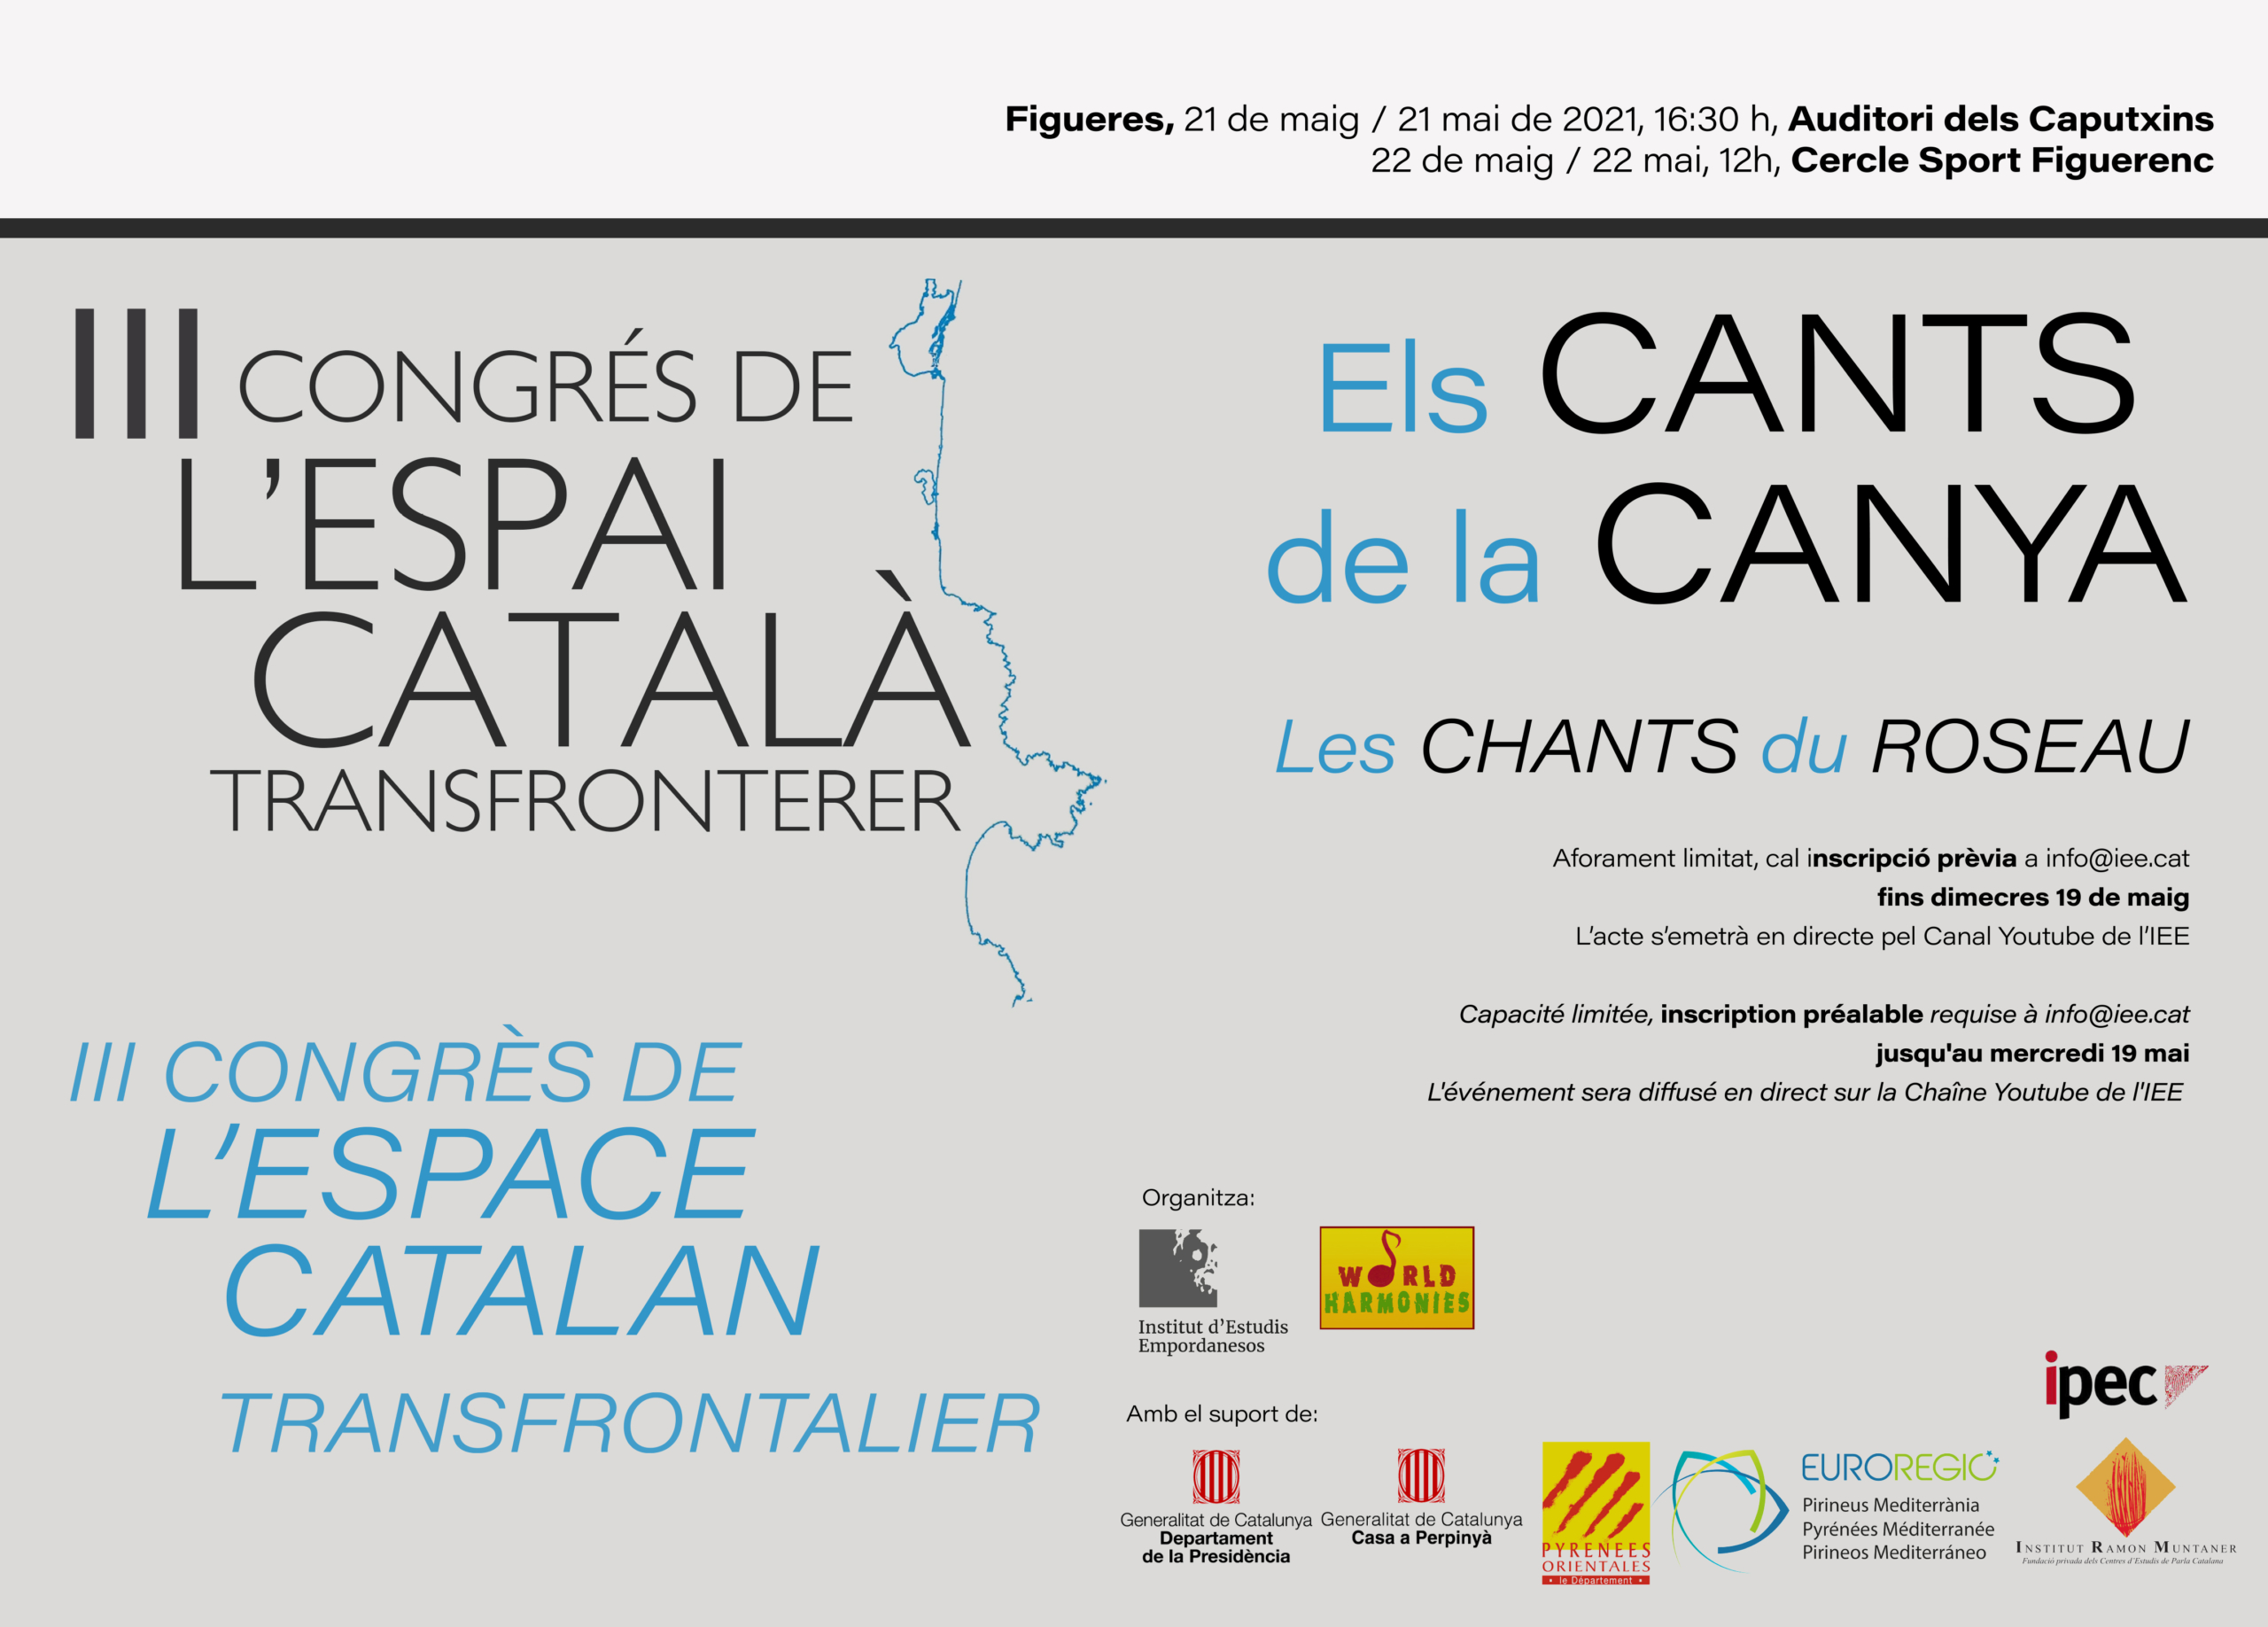 III Congrés de l'Espai Català Transfronterer, 21 i 22 de maig